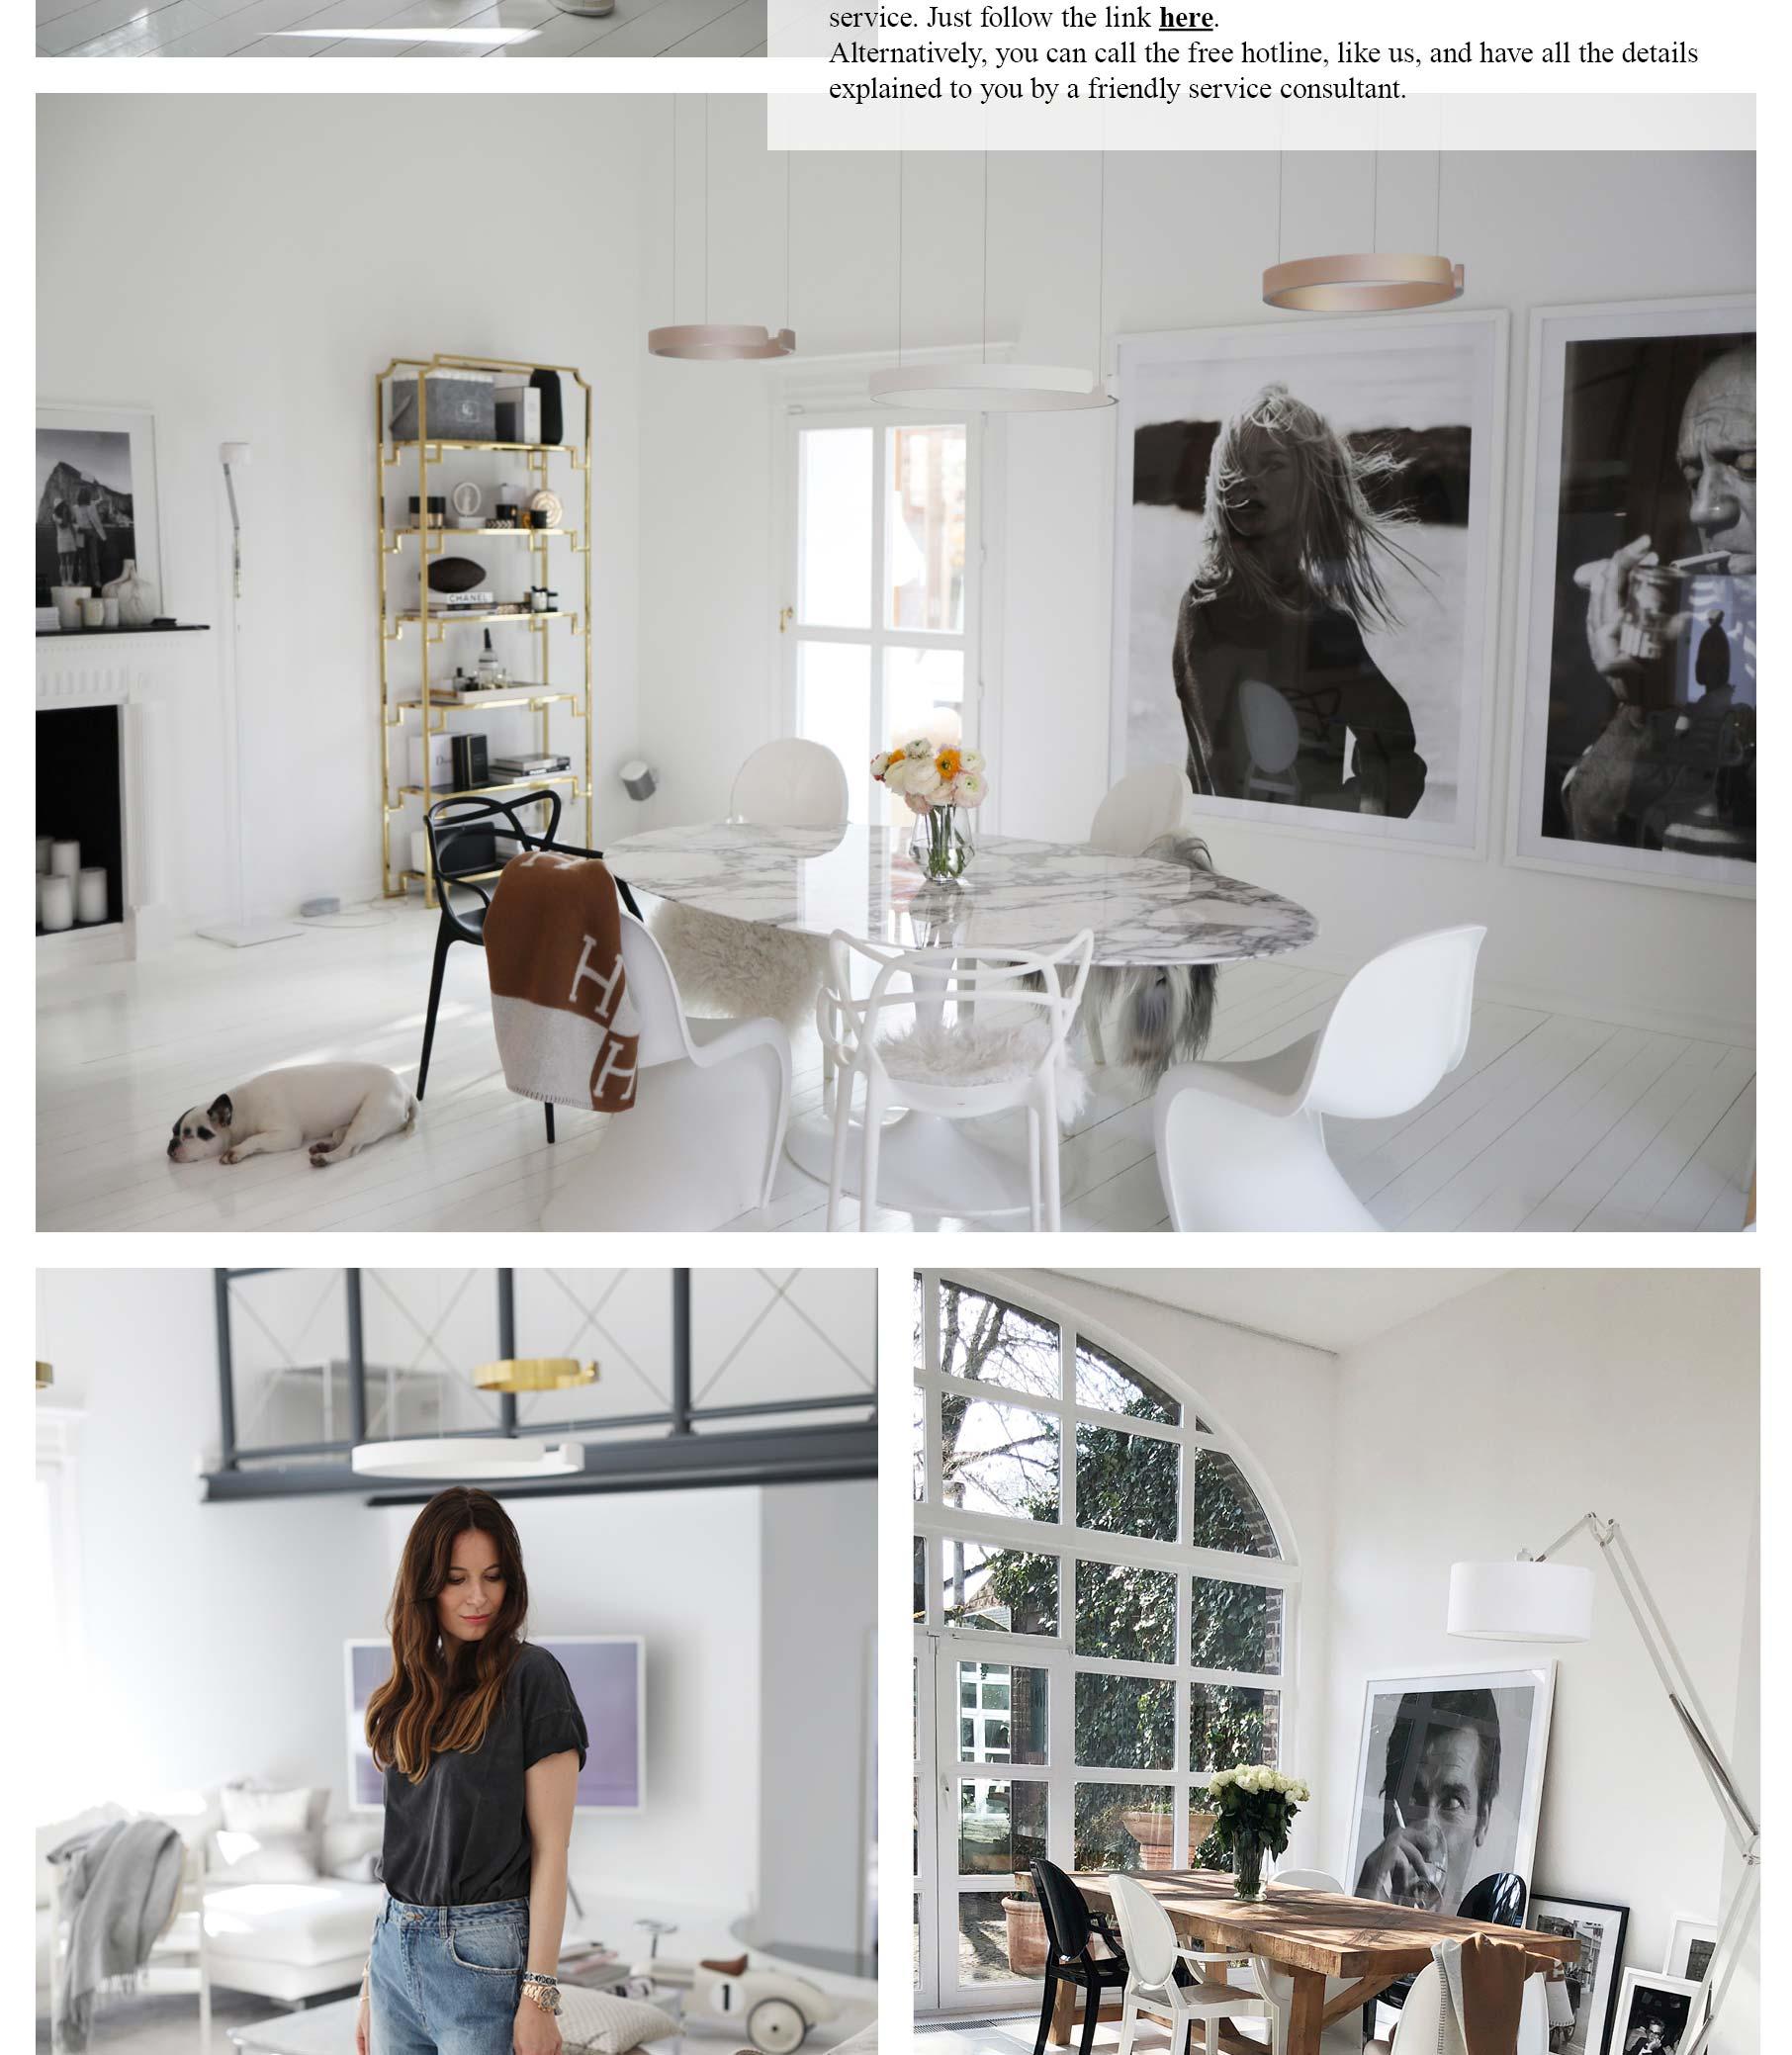 lena x telekom bauherren editorial lena terlutter. Black Bedroom Furniture Sets. Home Design Ideas